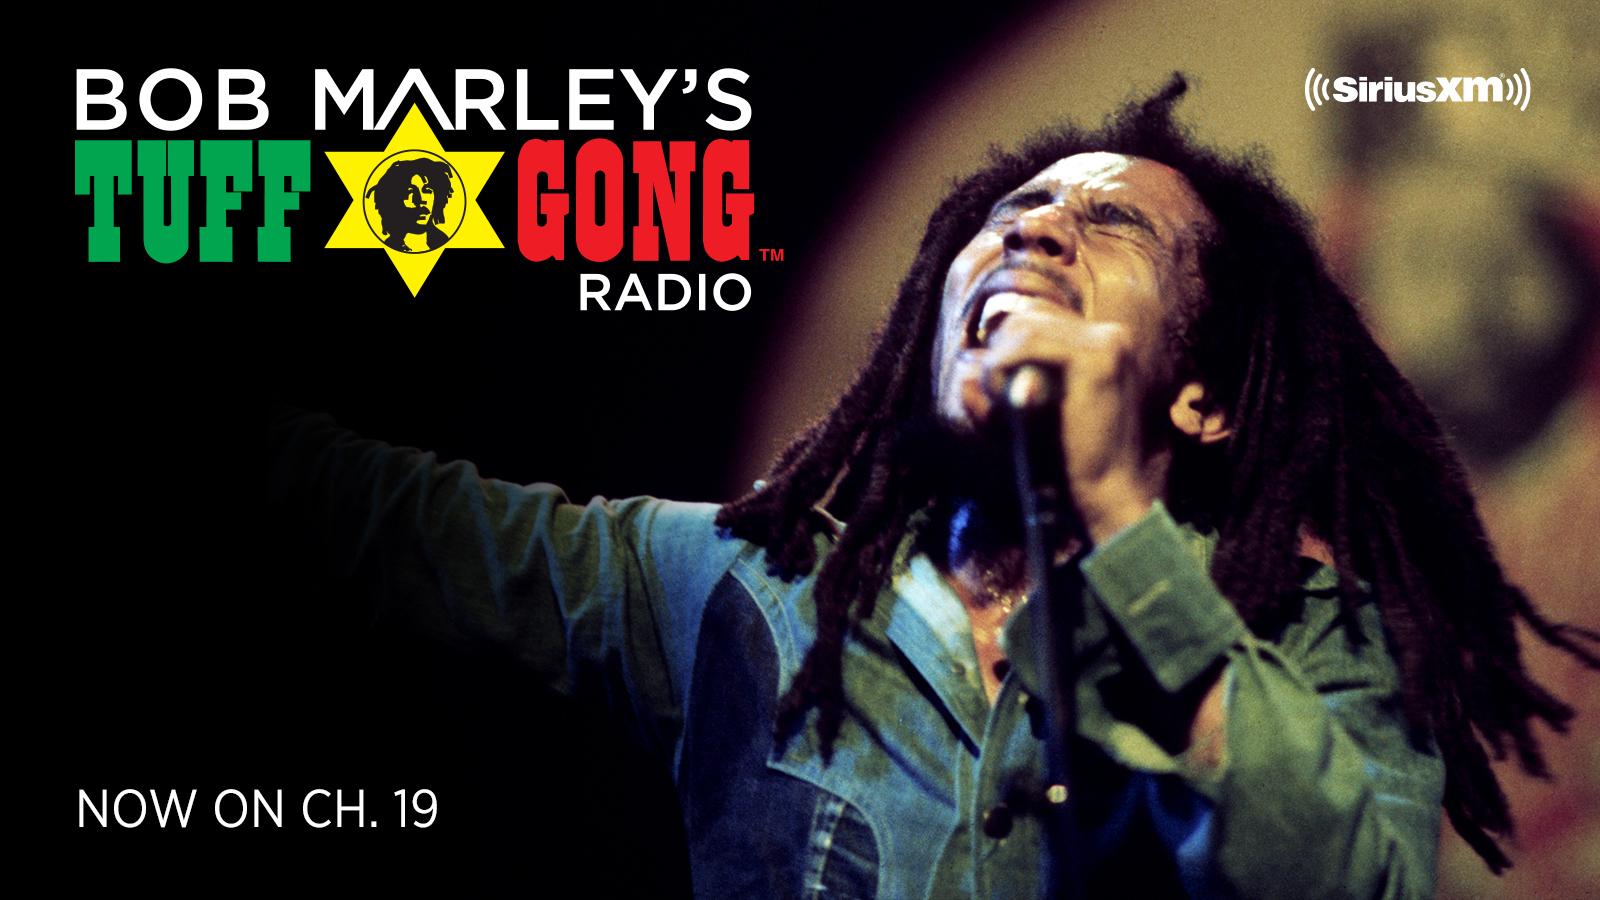 bob marley tuff gong radio siriusxm